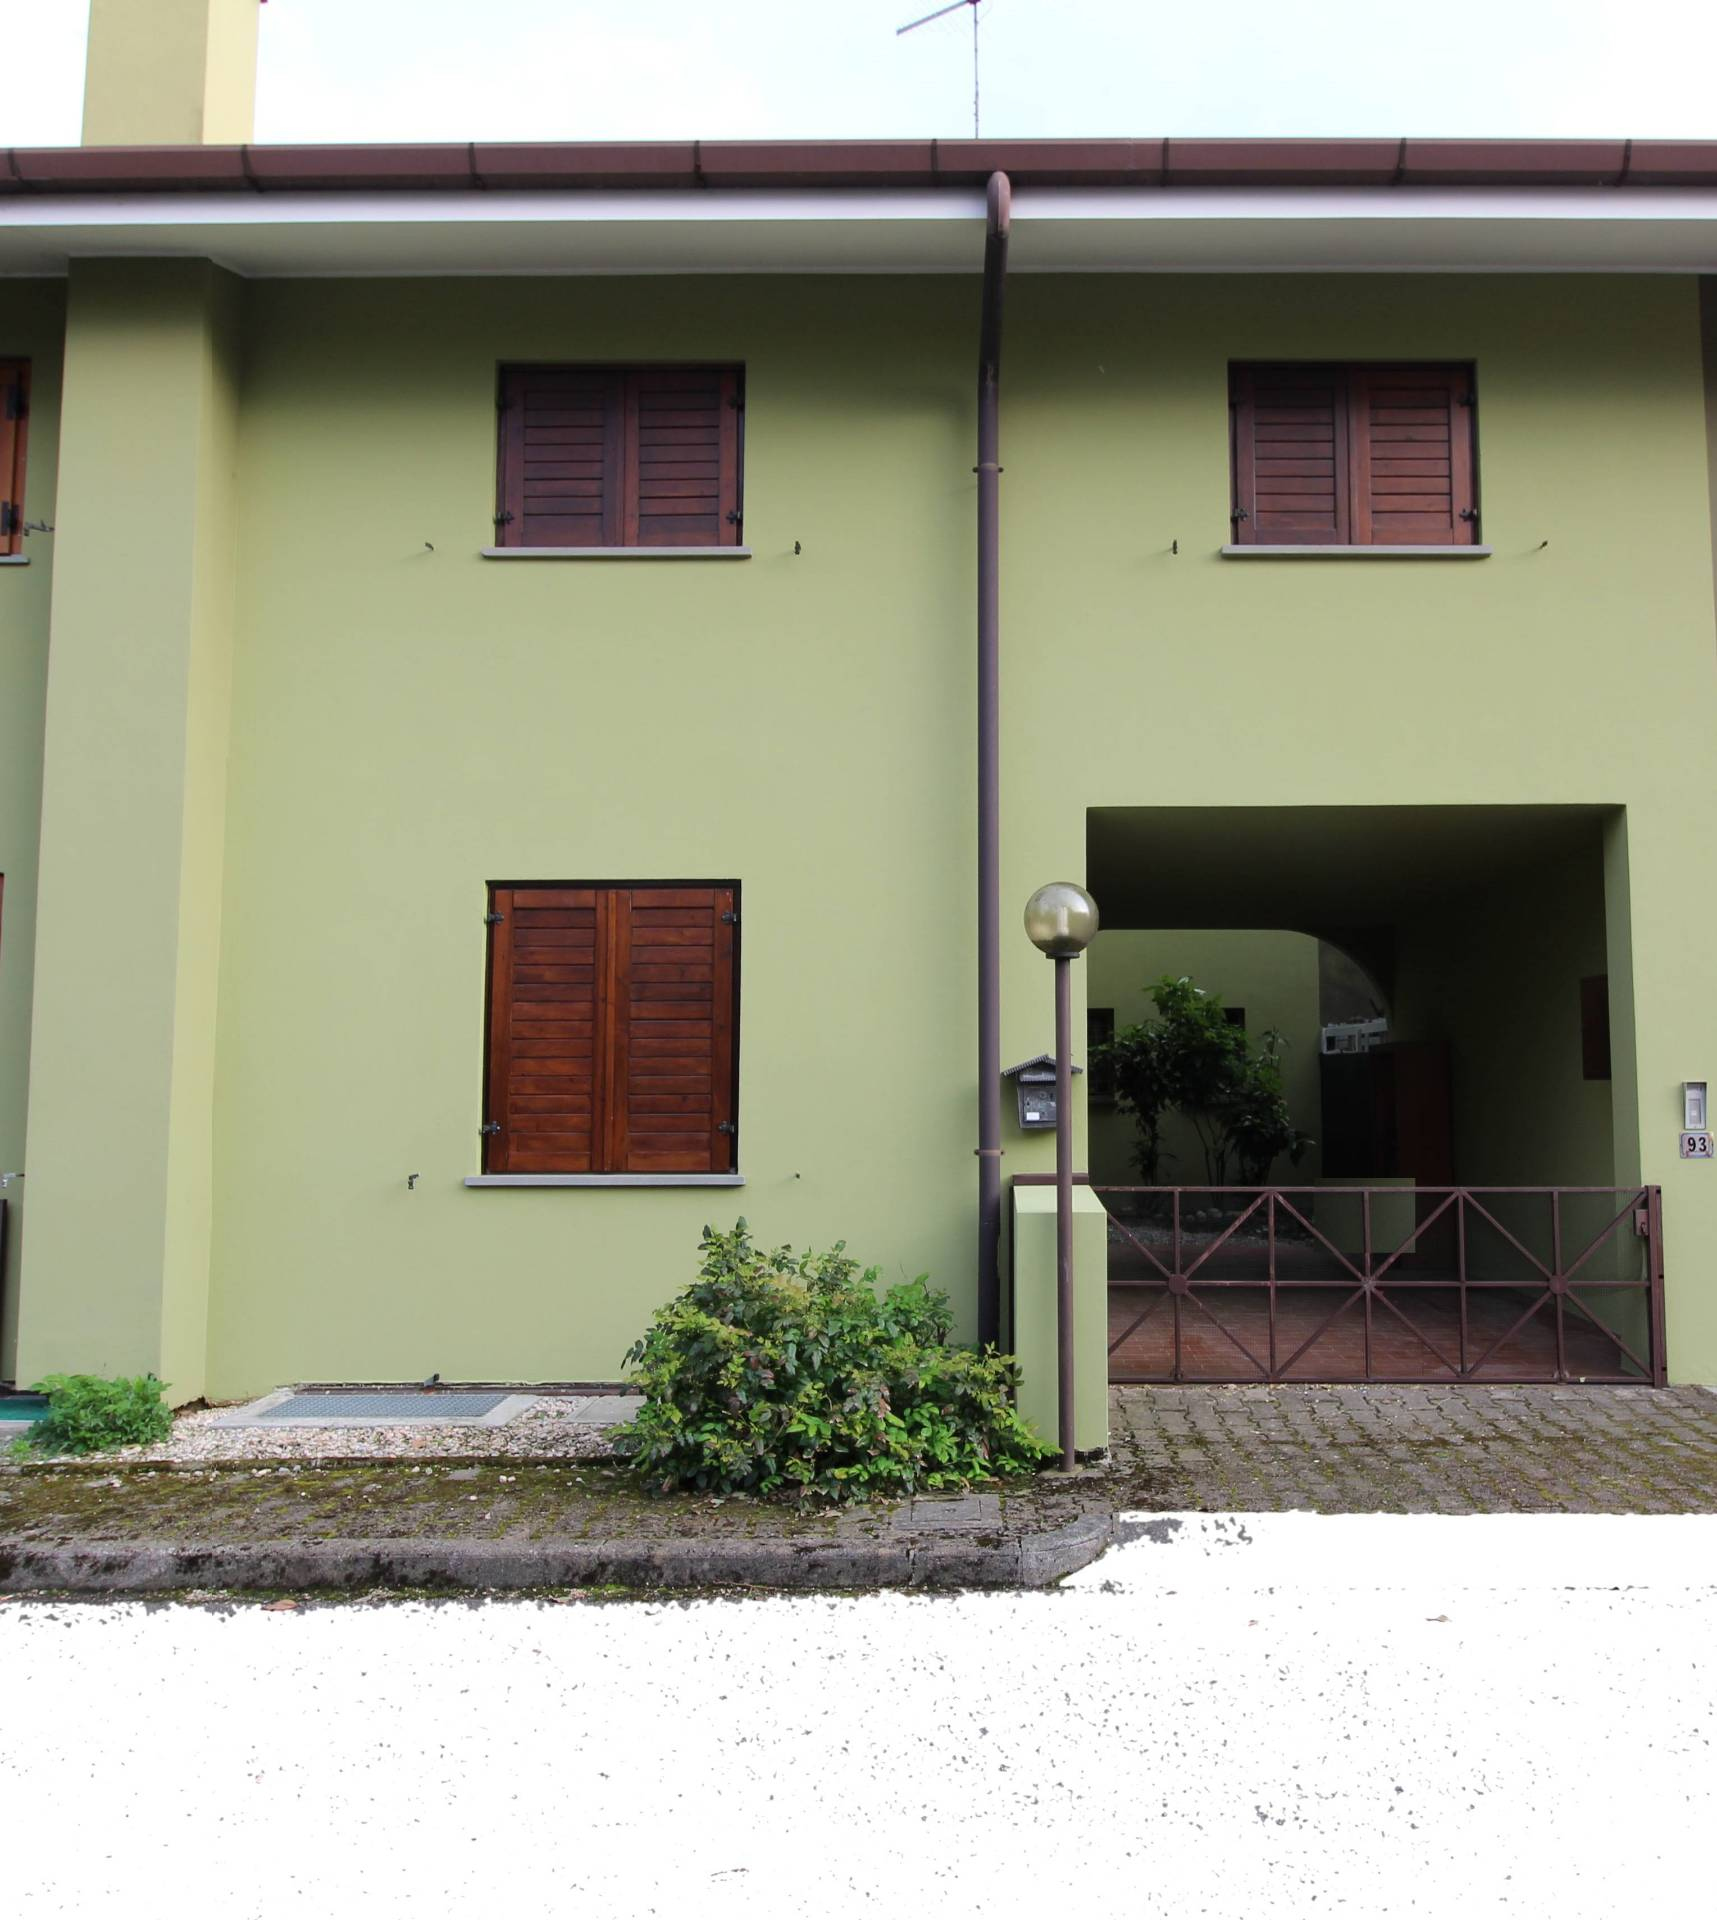 campoformido vendita quart:  il cottage